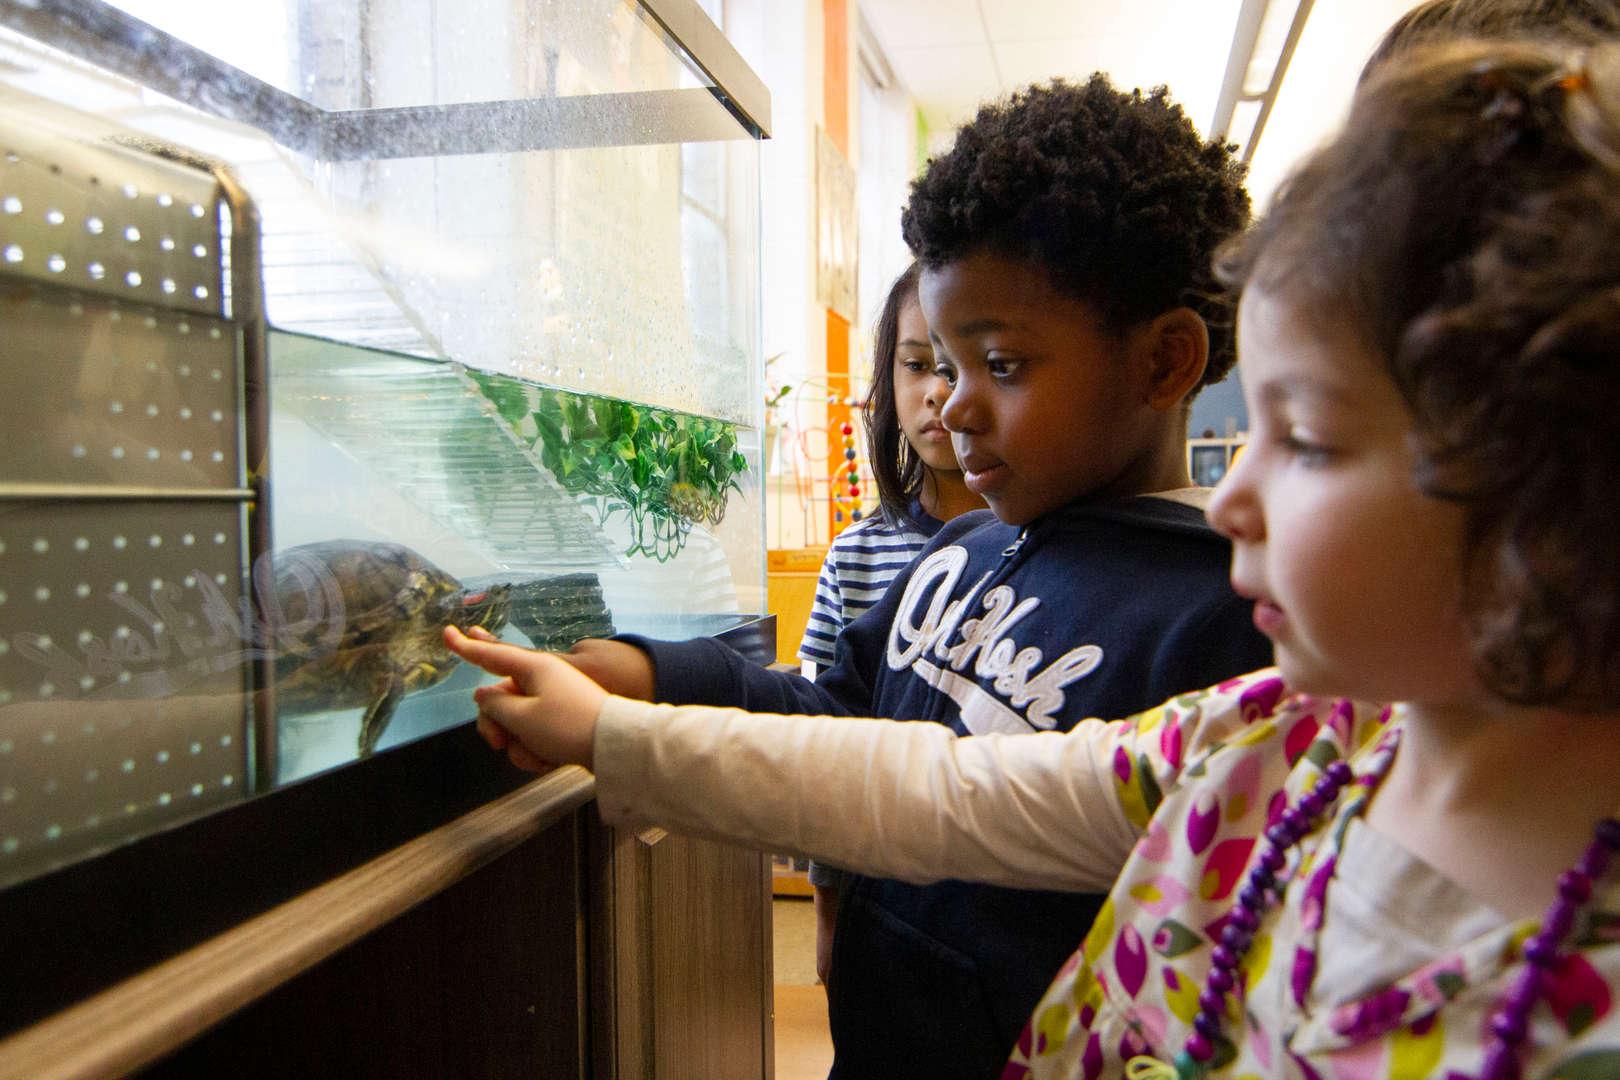 Kids looking at Amelia the turtle